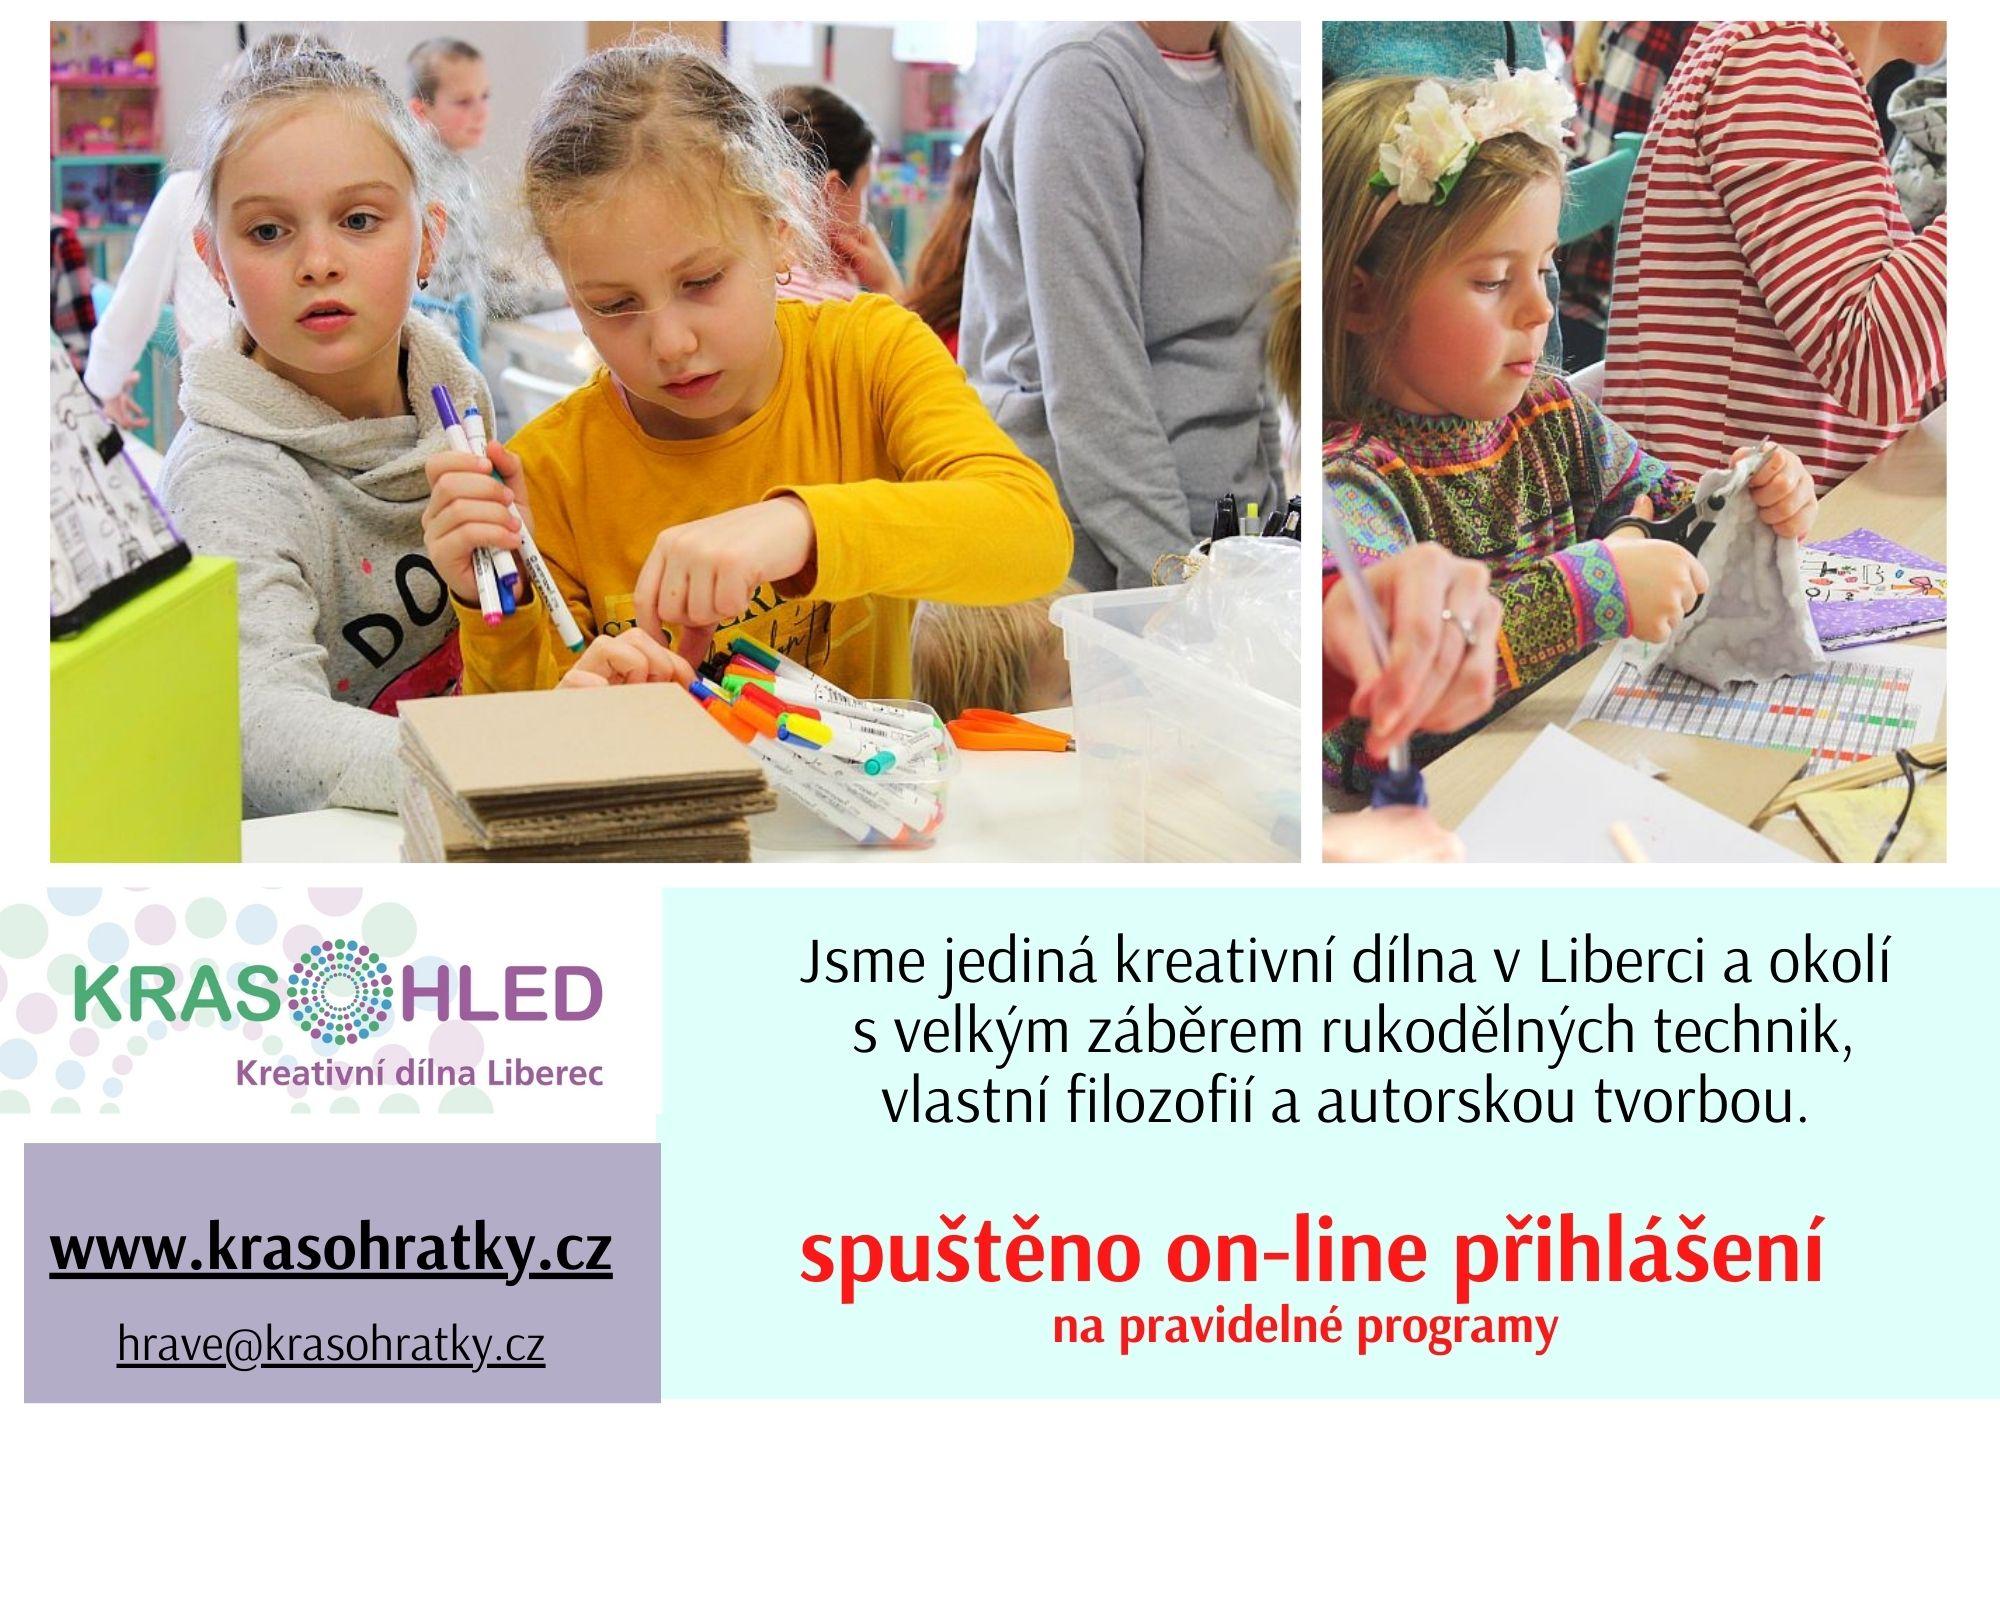 Krasohled Liberec-pravidelný program